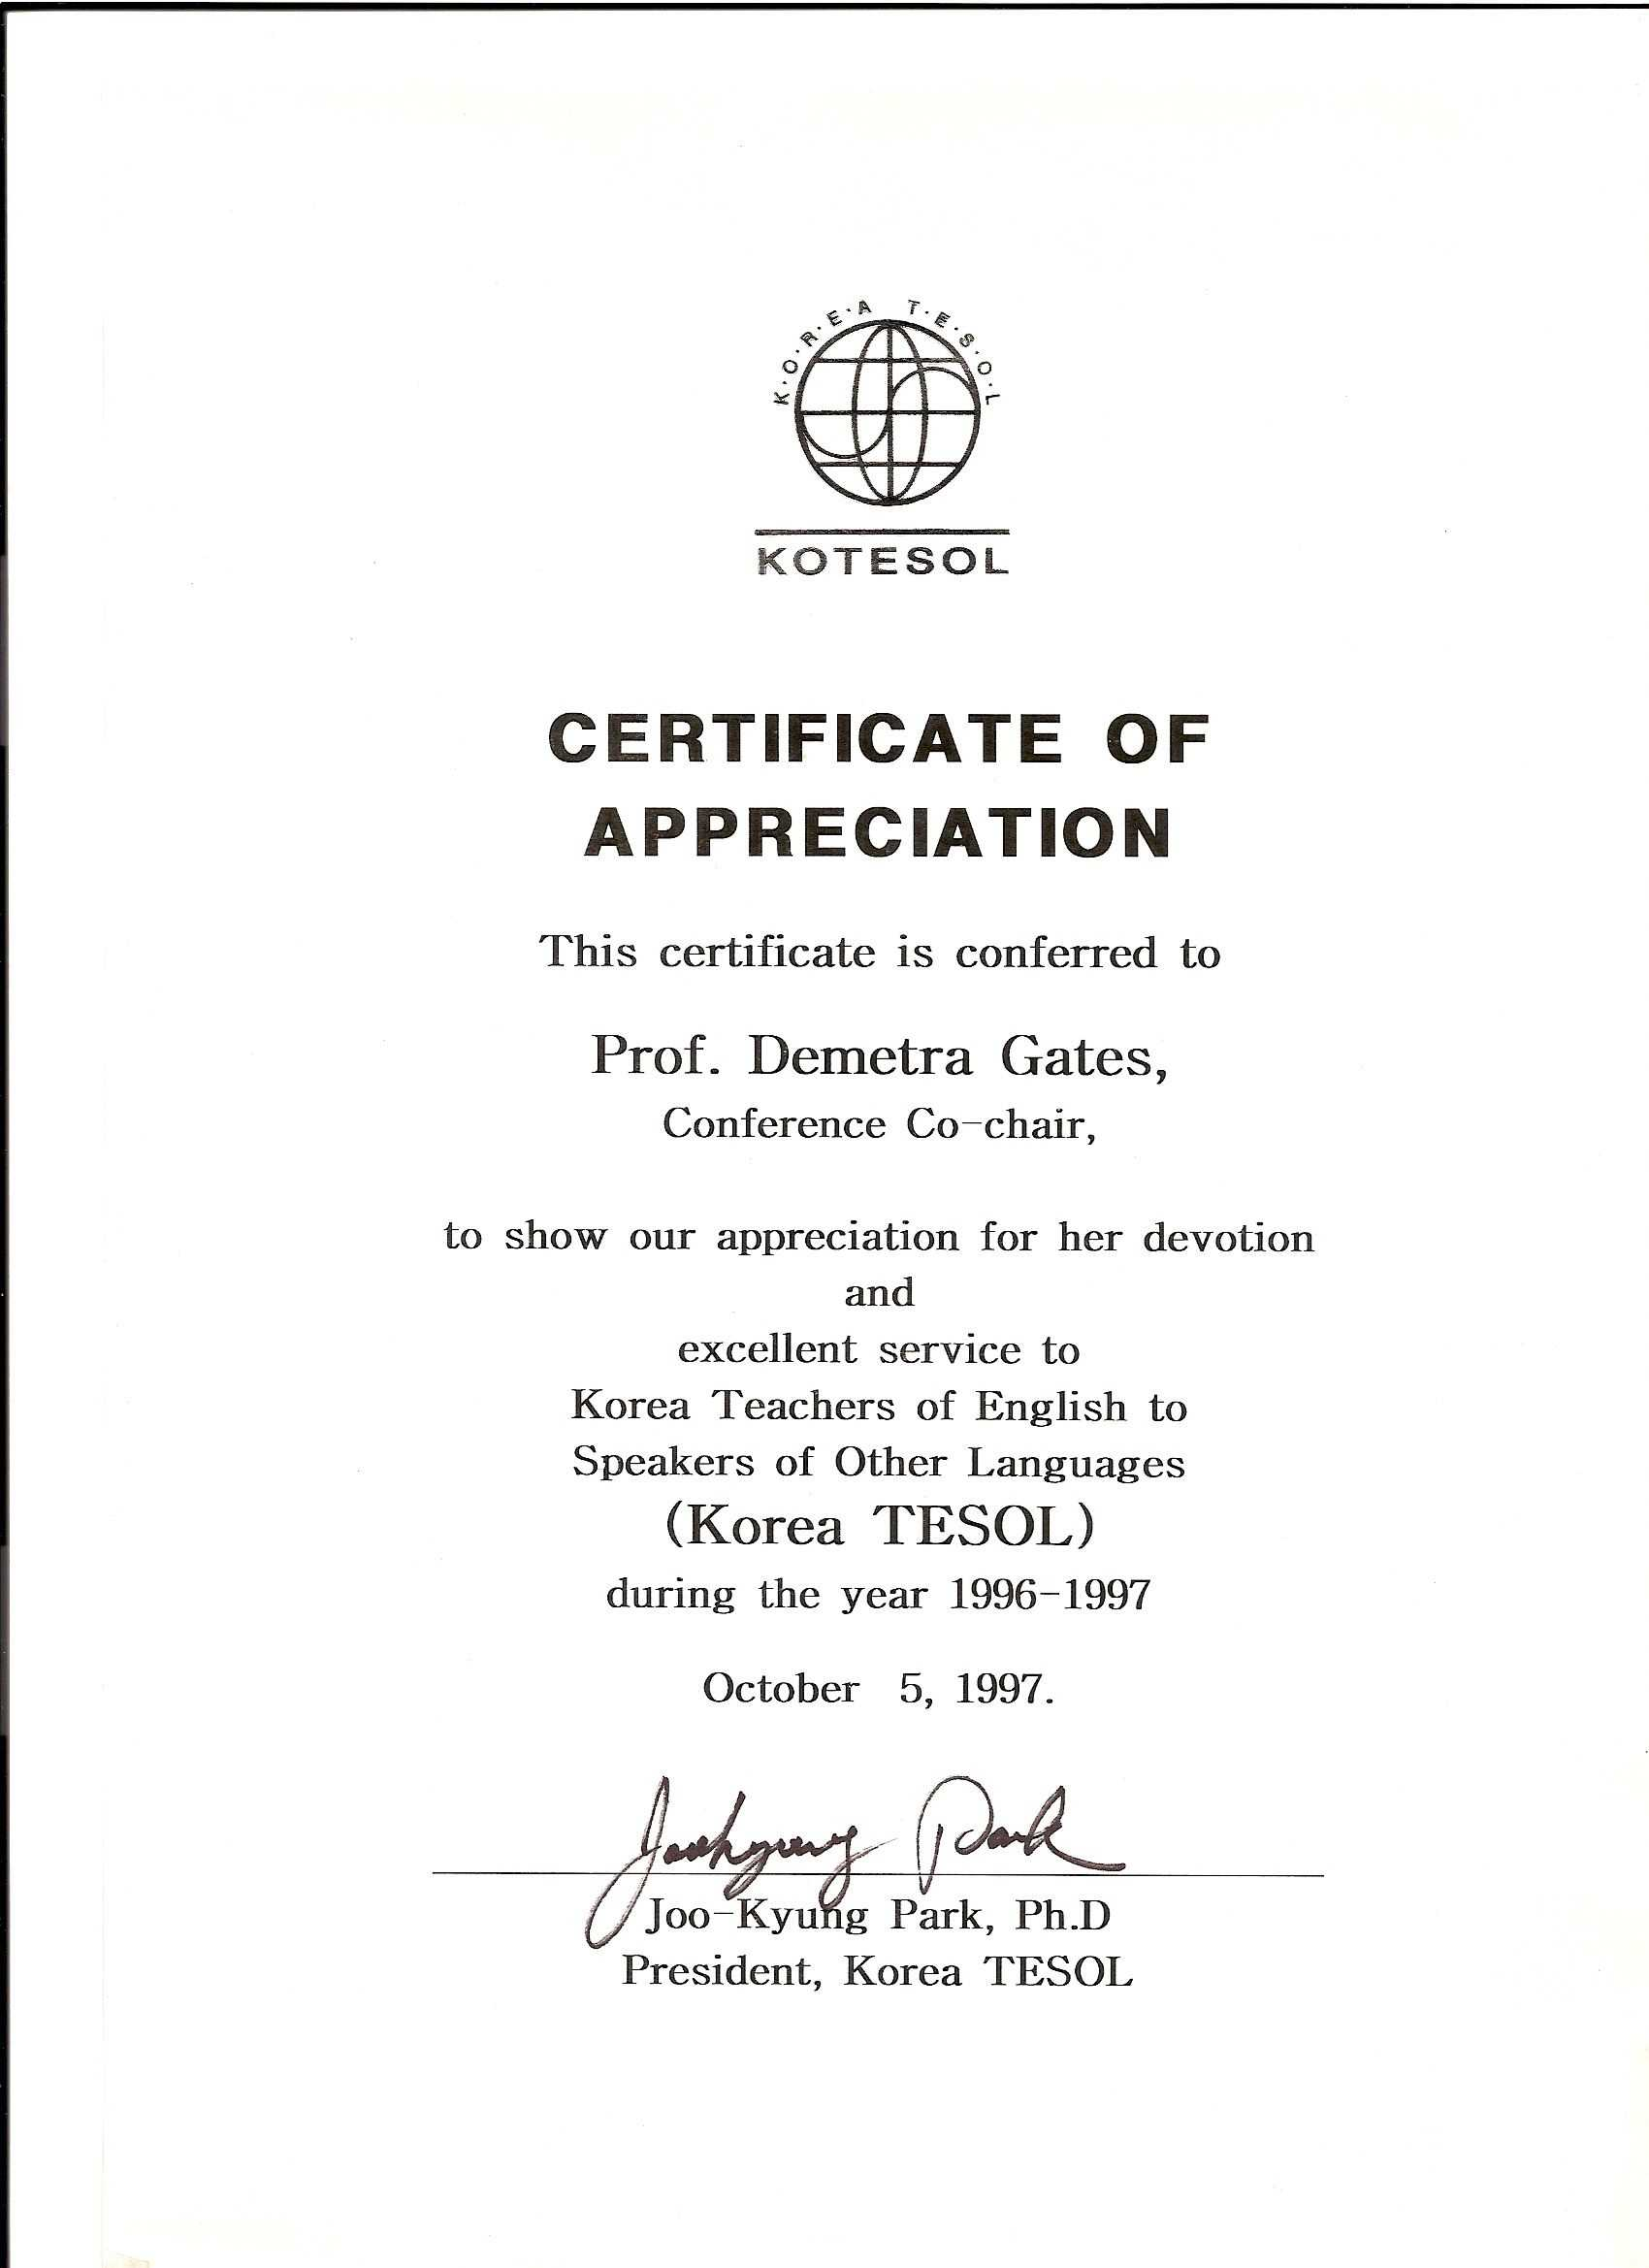 Kotesol Presidential Certificate Of Appreciation (1997 Regarding Army Certificate Of Appreciation Template